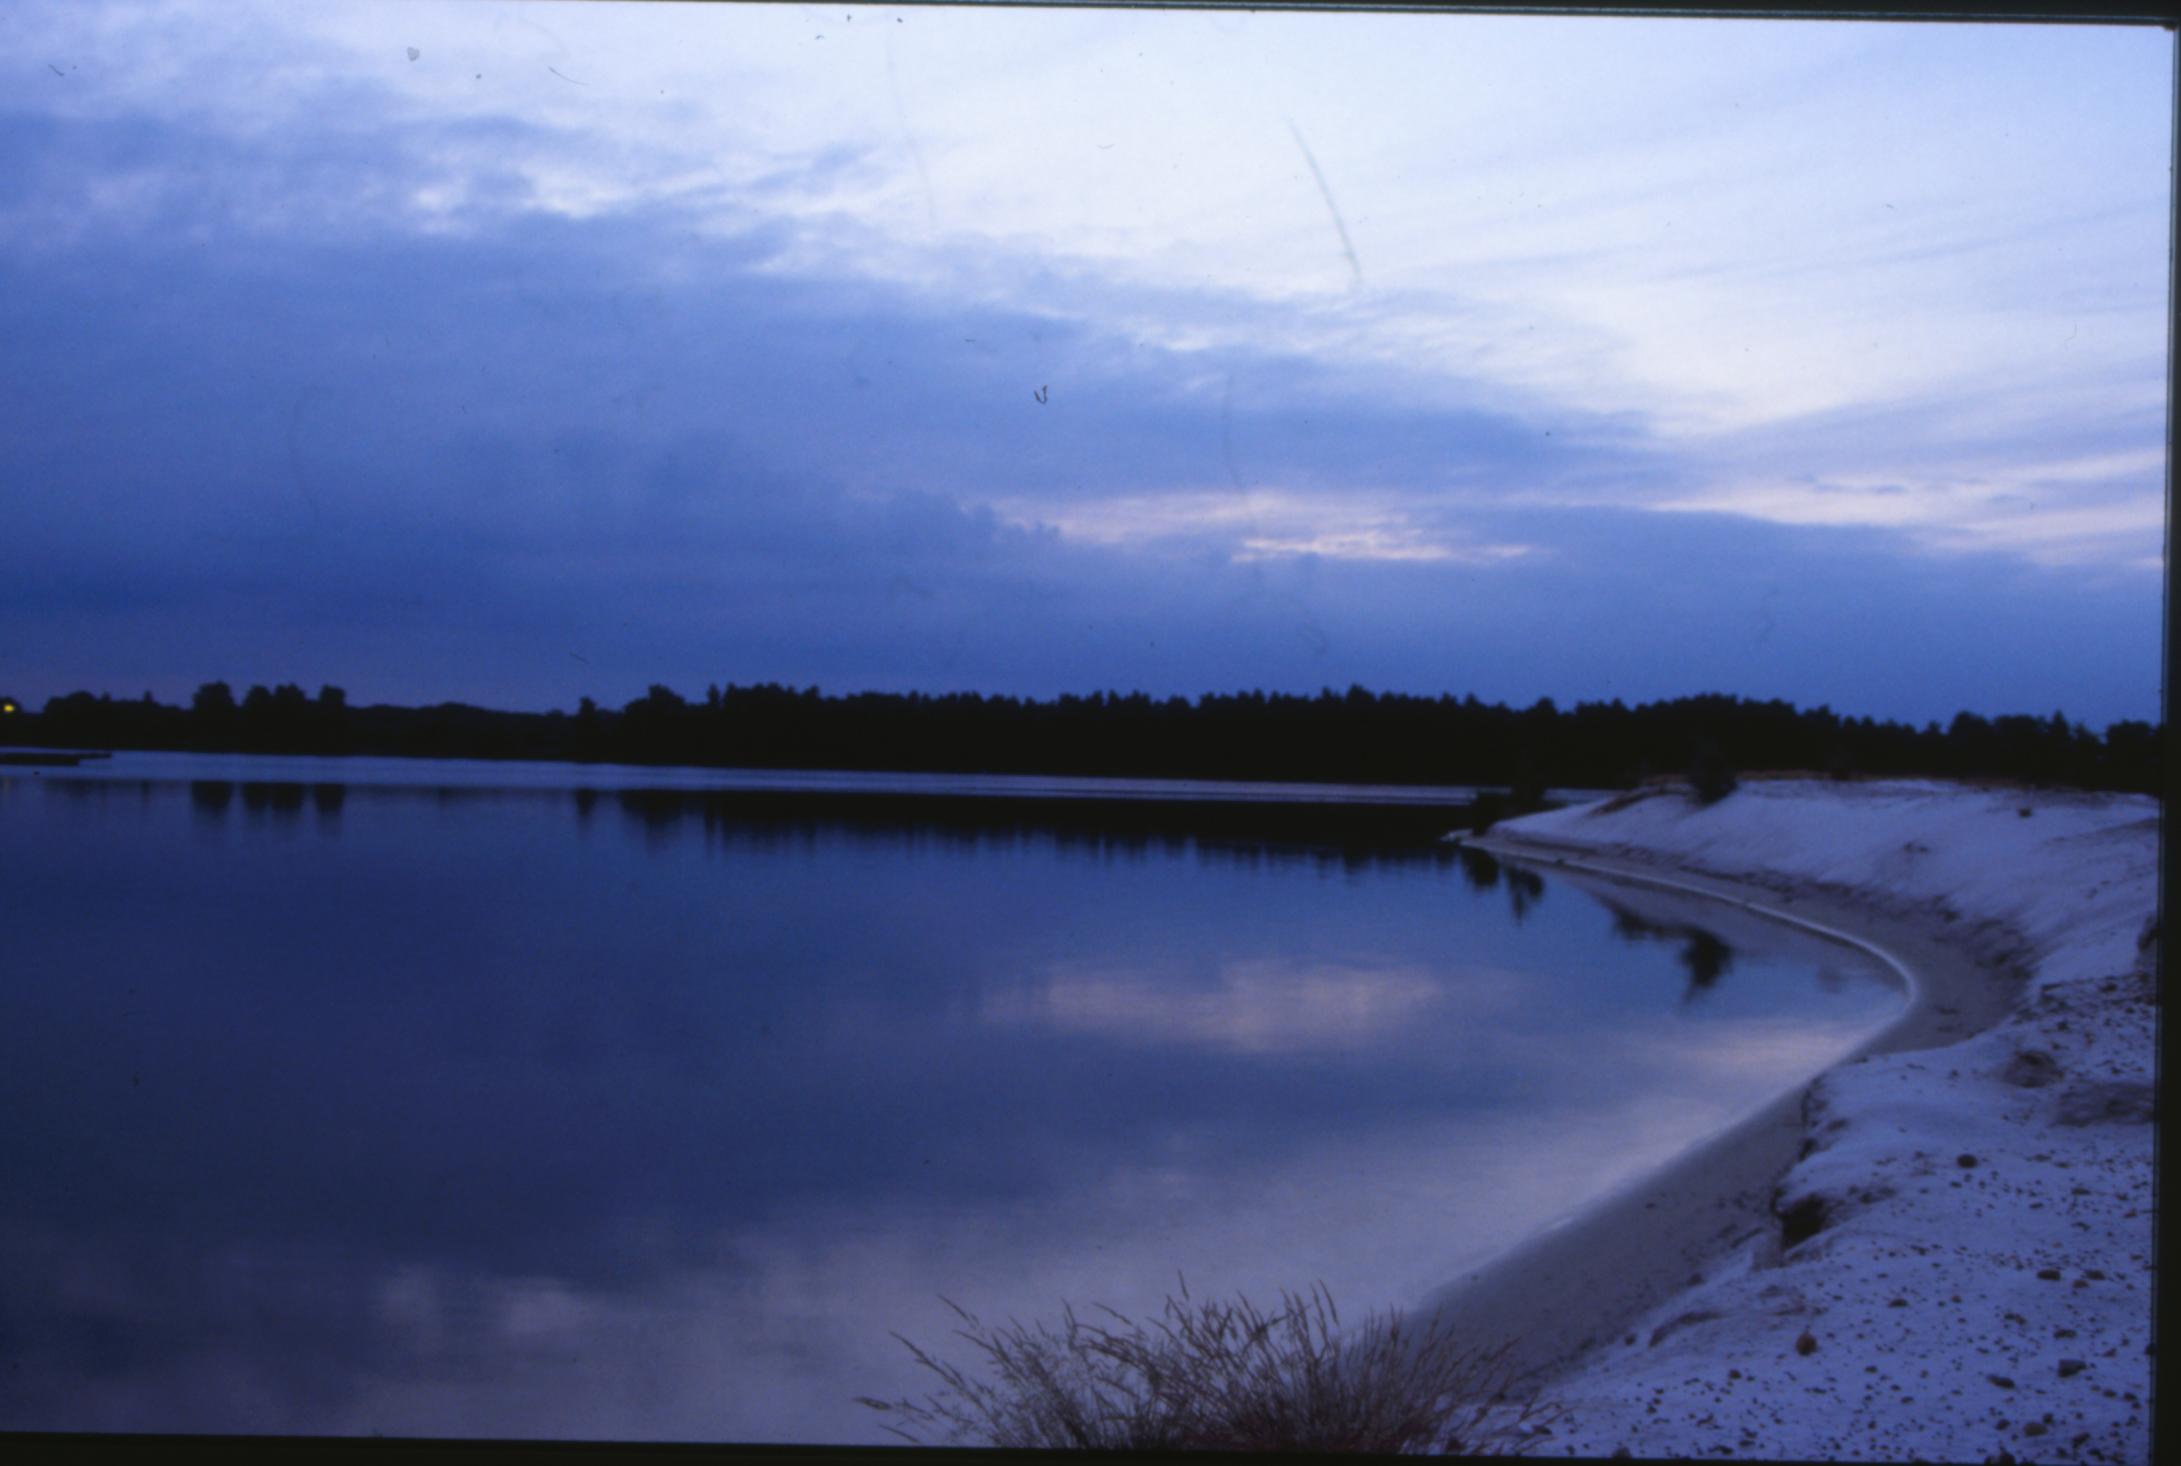 Winter Landscape, Calm, Clouds, Cold, Ice, HQ Photo